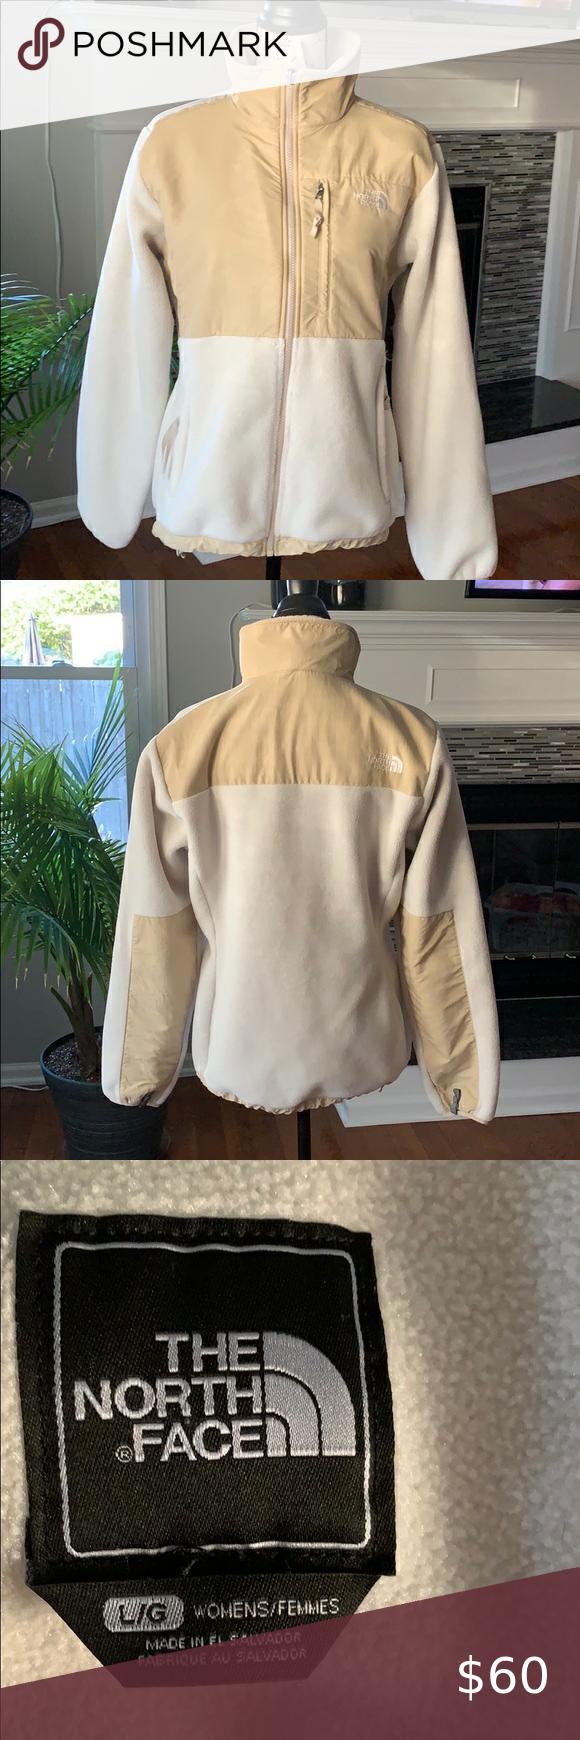 White And Tan North Face Jacket Polartec White And Tan Northface Jacket Polartec Excellent Condition S White North Face Jacket North Face Jacket Clothes Design [ 1740 x 580 Pixel ]